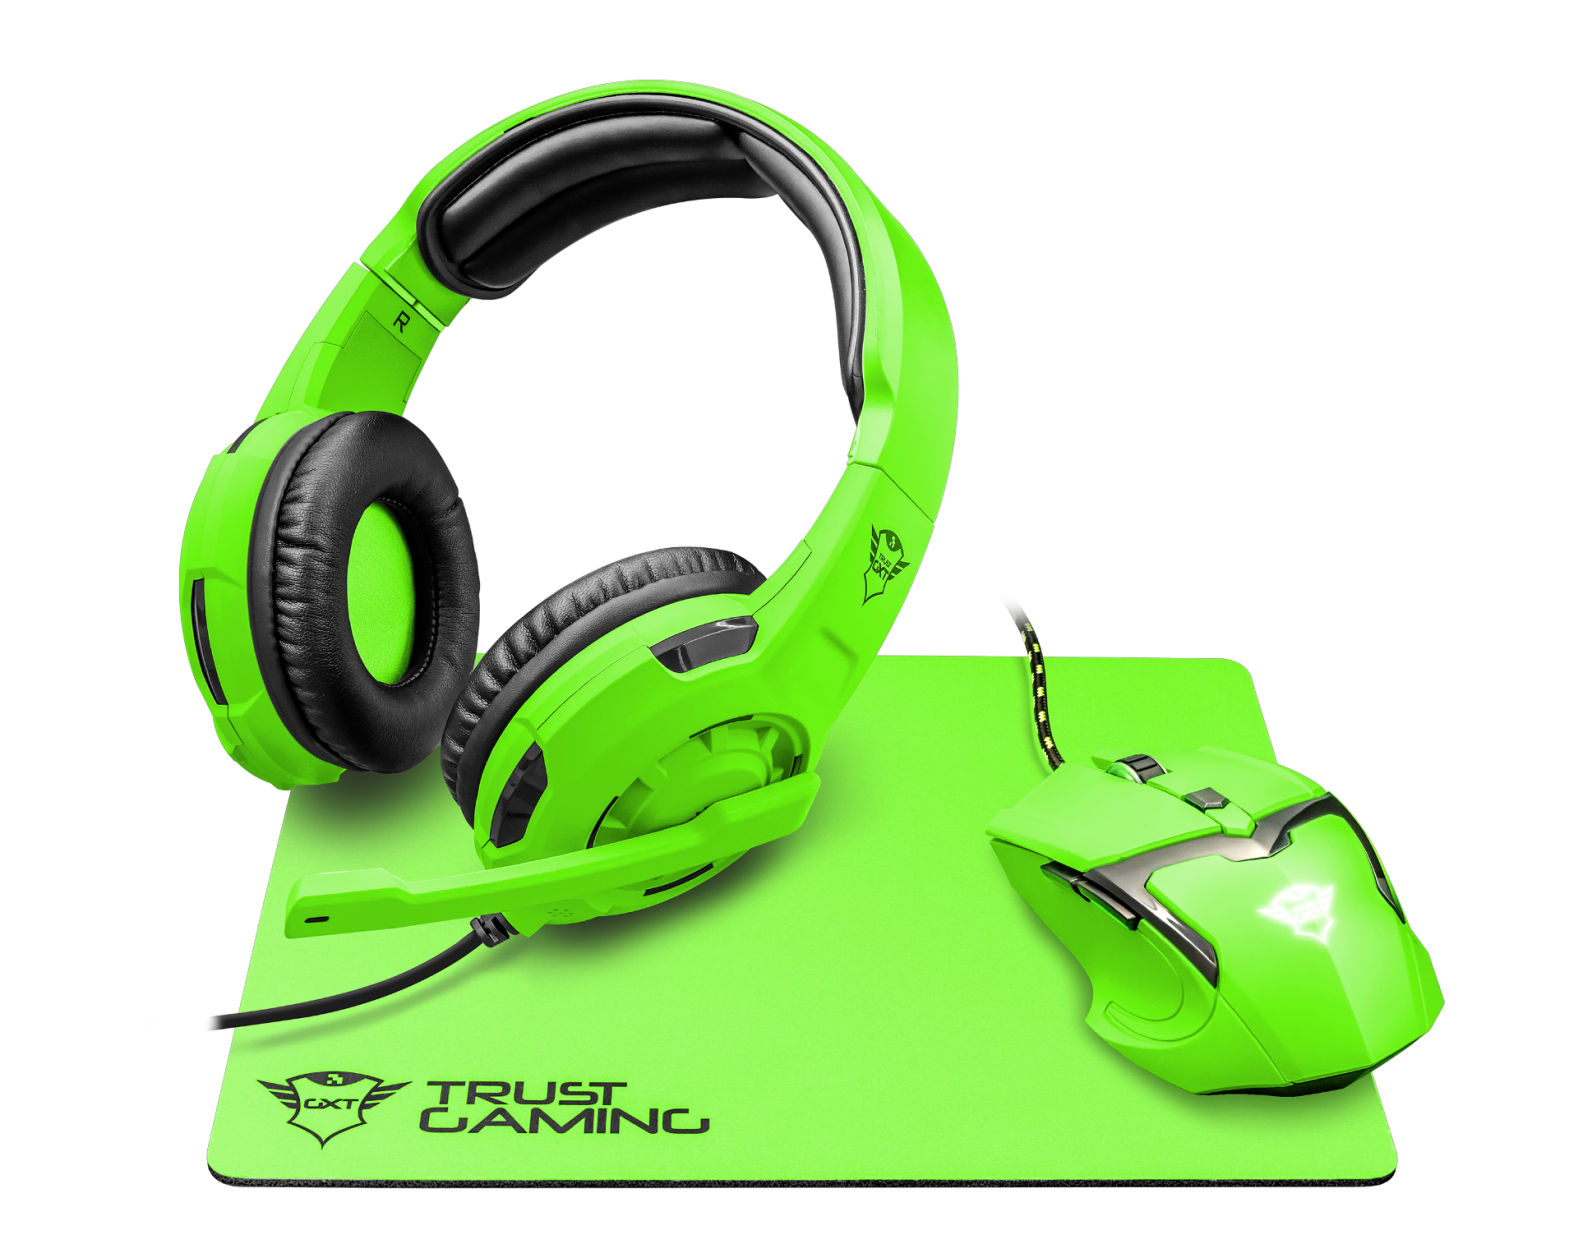 TRUST Sluchátka s mikrofonem GXT790 SG hern myÅ¡ SPECTRA GAMING BUNDLE green